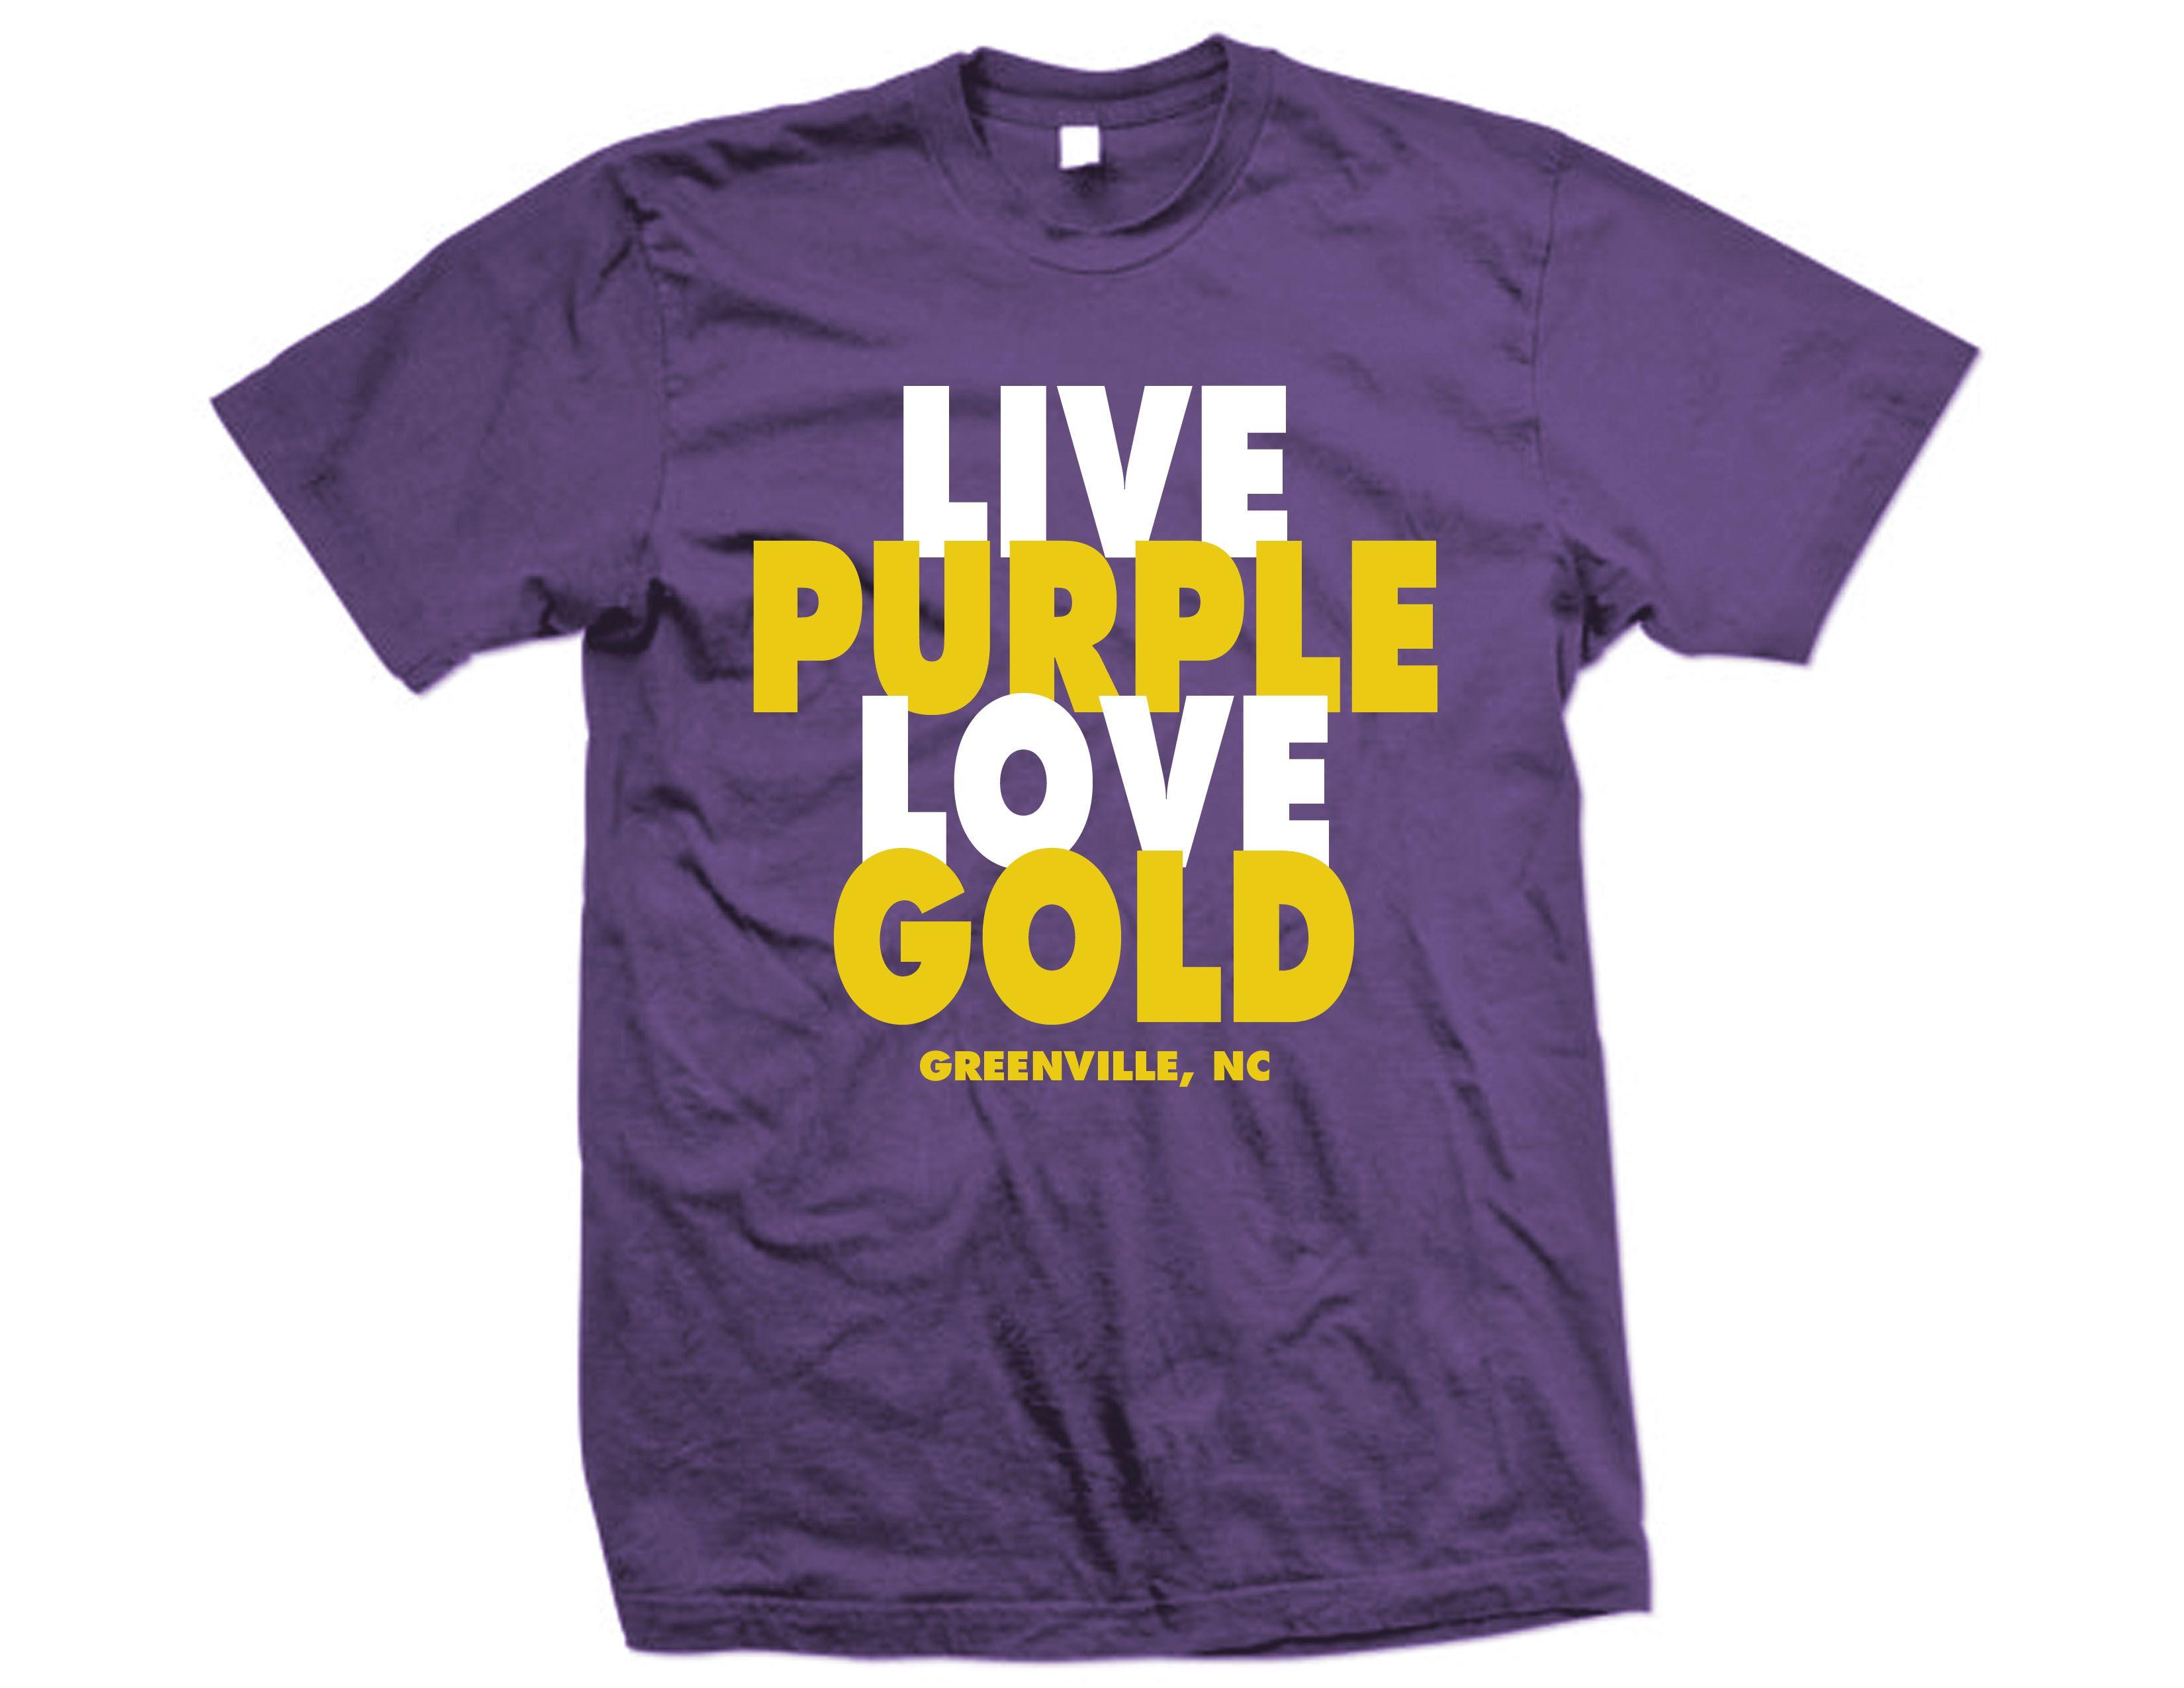 Color printing ecu - 32 Days Till Ecu Pirate Football Live Purple Love Gold 15 99